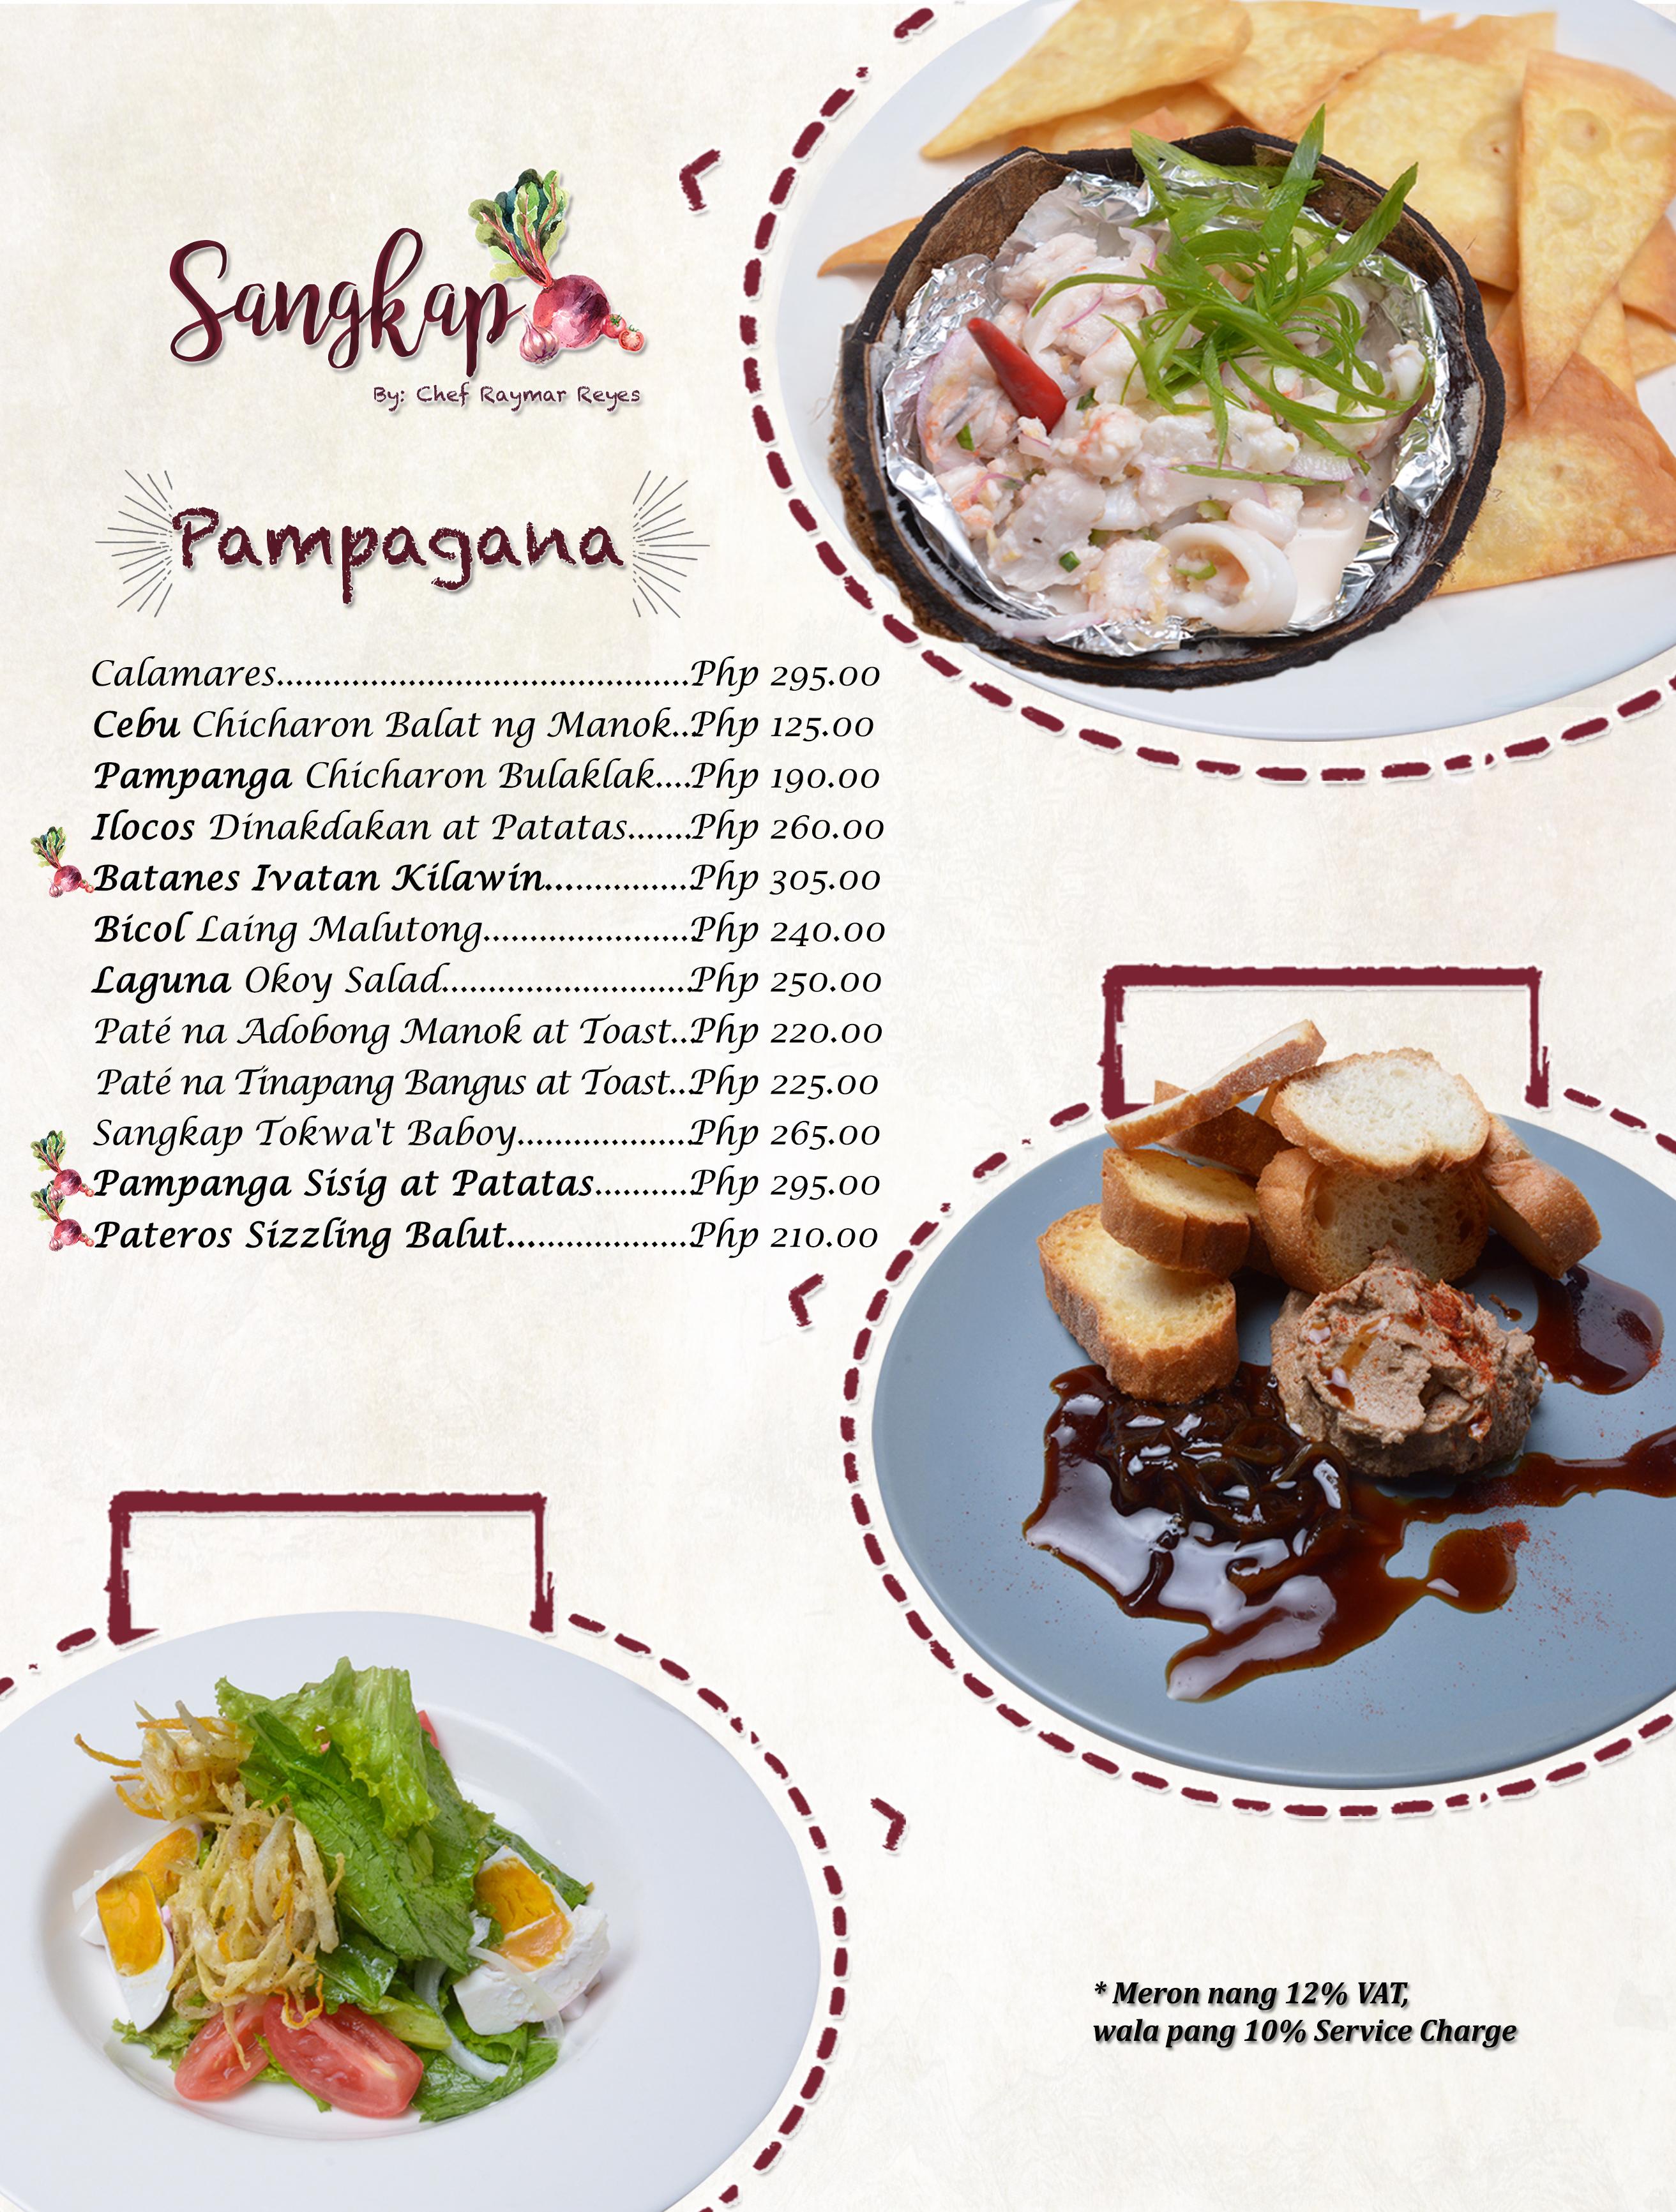 Sangkap Filipino Restaurant | Filipino Food Blogger — Always